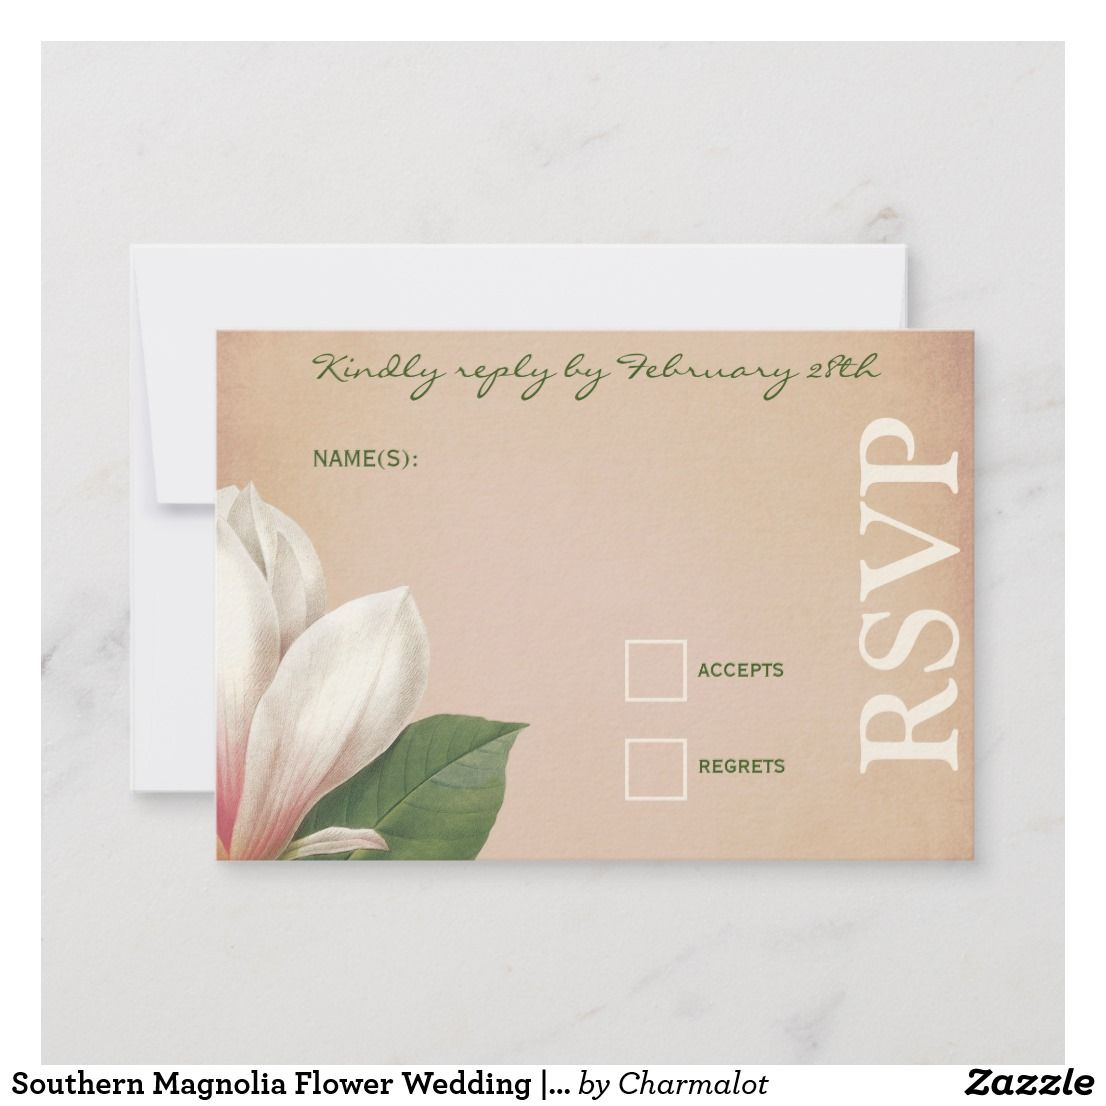 Southern Magnolia Flower Wedding Antique Blush Rsvp Card Zazzle Com Magnolia Flower Wedding Flowers Fun Wedding Invitations